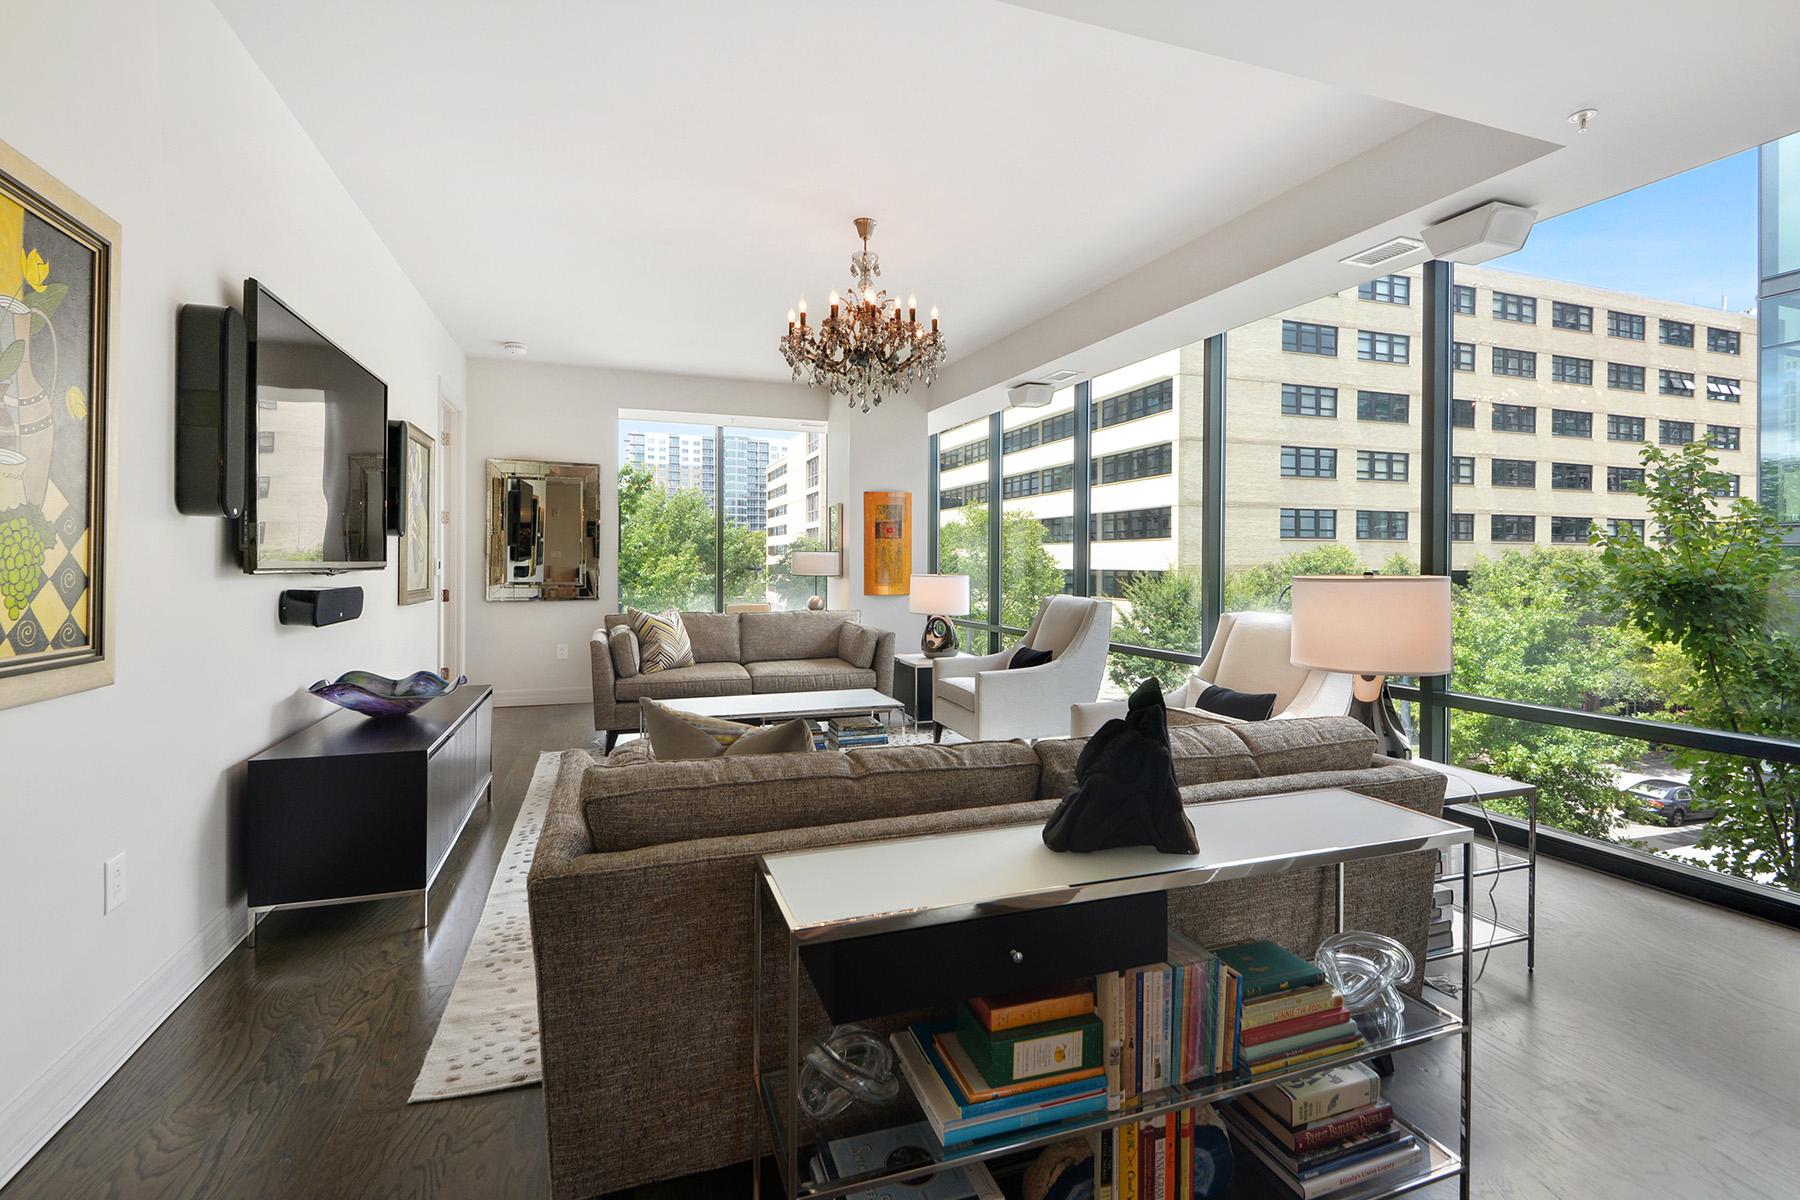 Condominiums для того Продажа на Absolutely Stunning Designer Corner Unit Featuring Floor-To-Ceiling Windows 867 Peachtree Street No. 302, Atlanta, Джорджия 30308 Соединенные Штаты